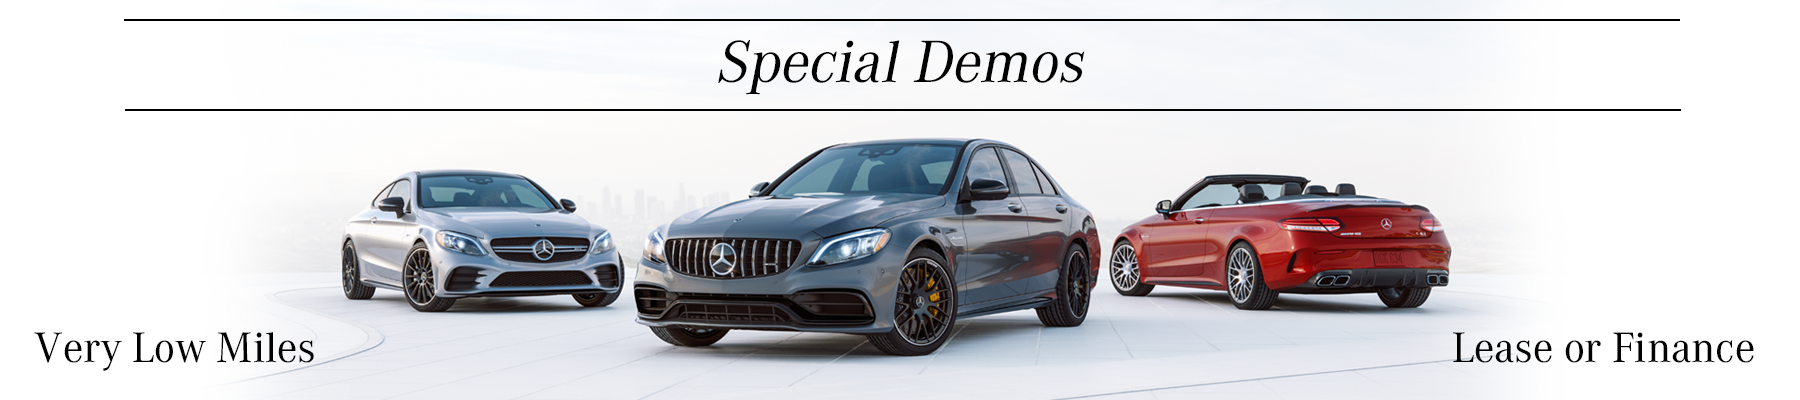 Dealer Demo Specials